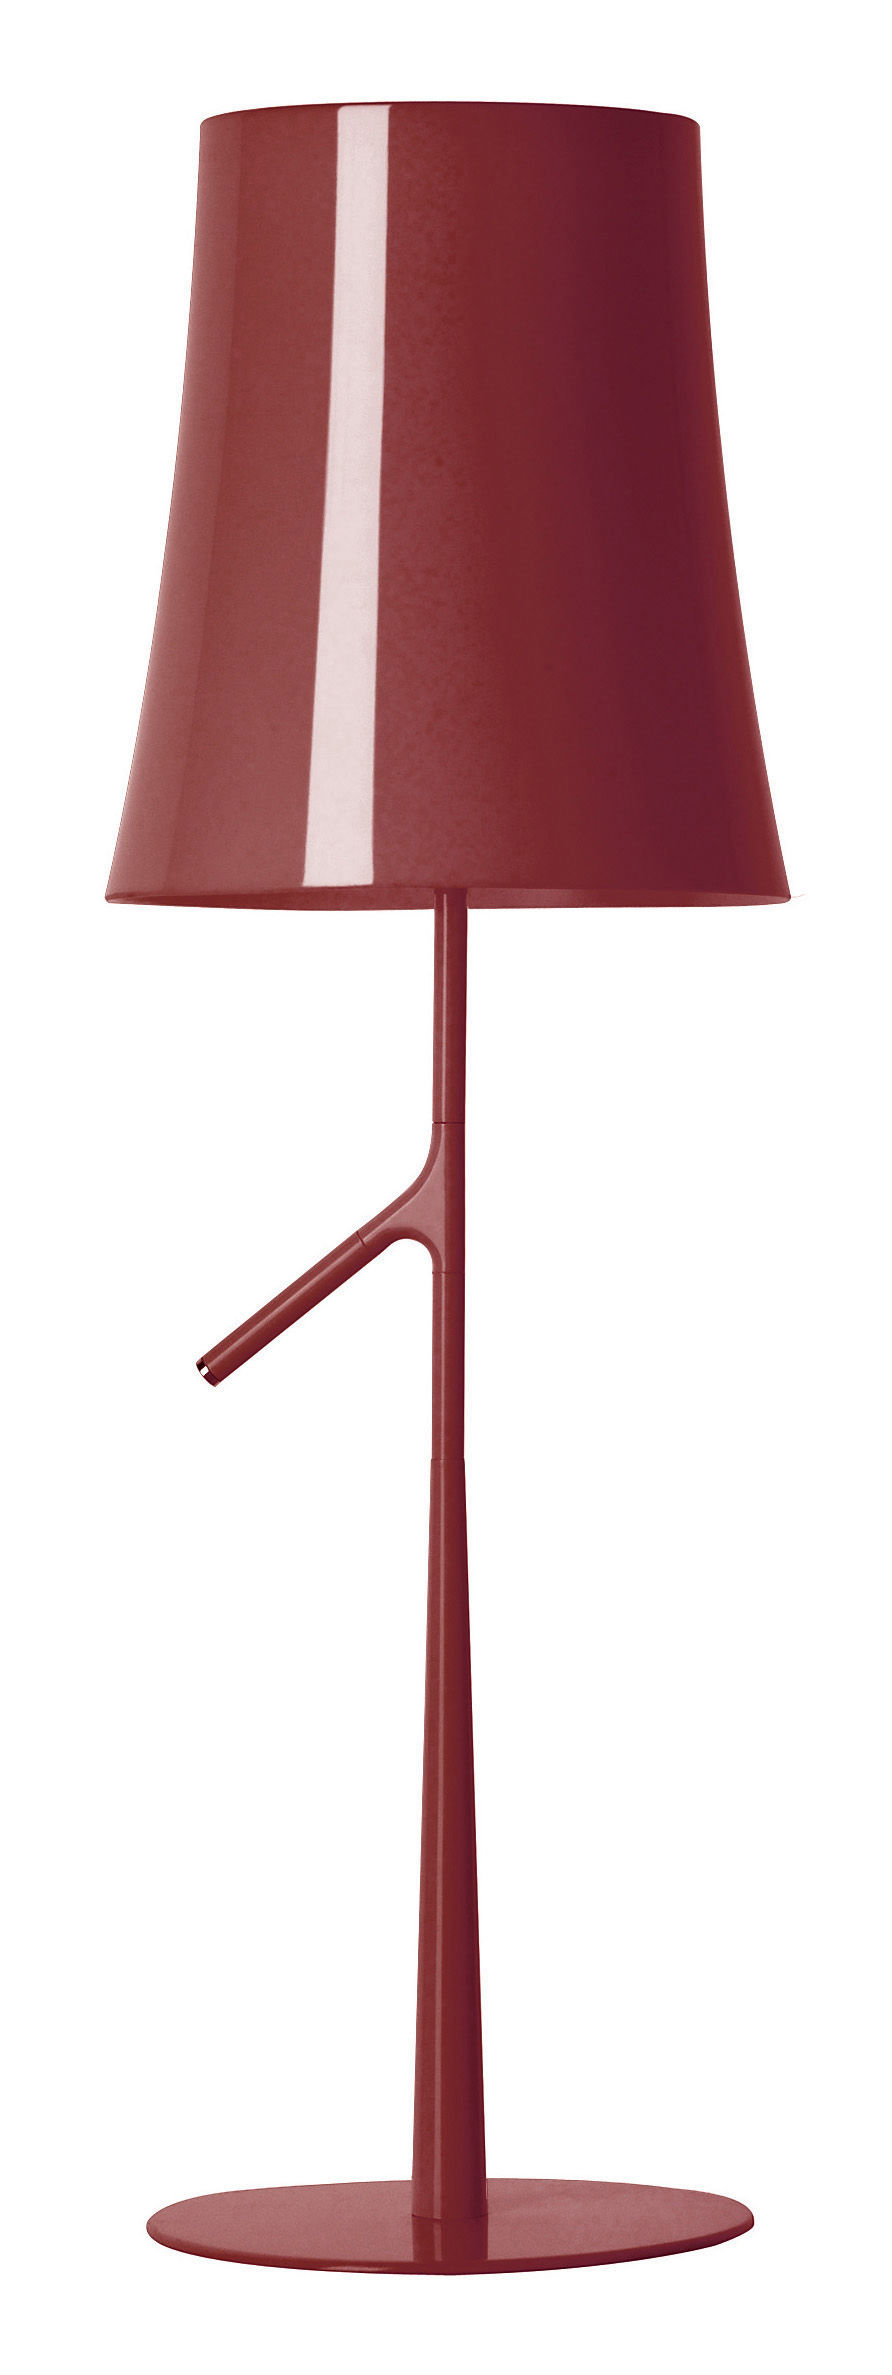 Lampe de table birdie grande h 70 cm amarante foscarini for Alessi porte prezzi